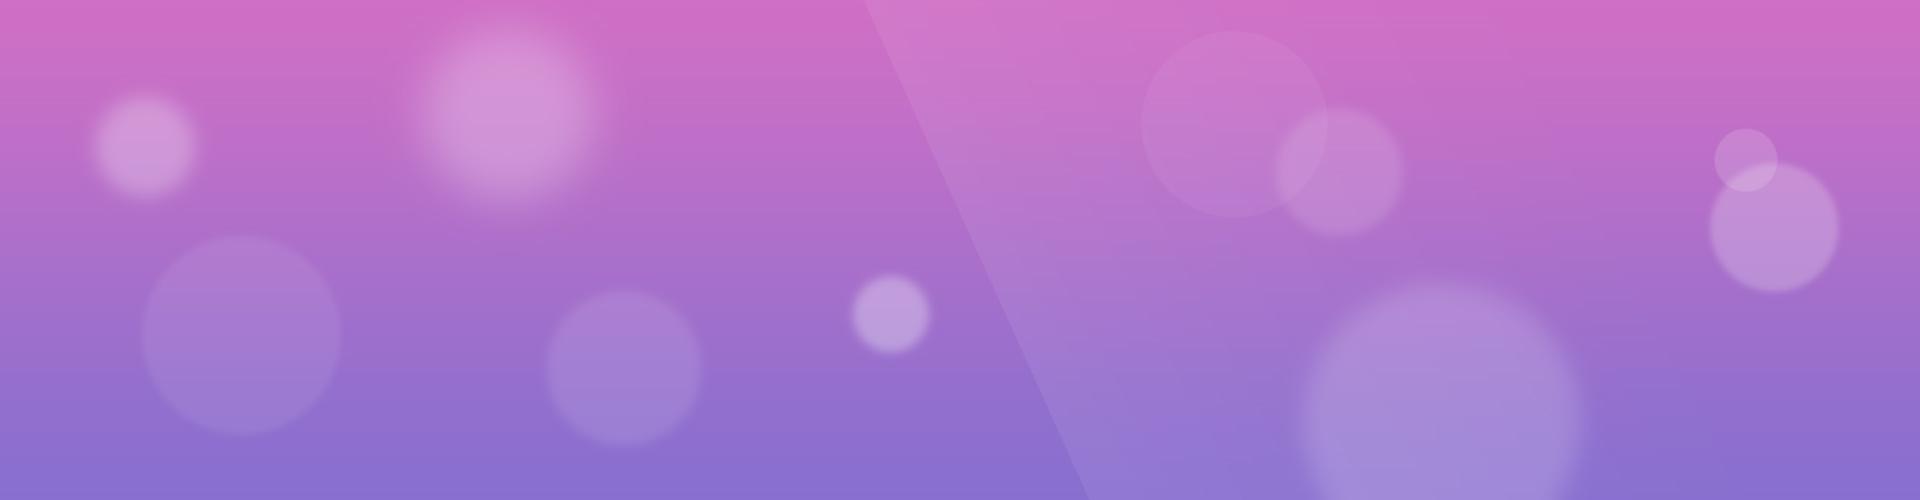 violet-bg